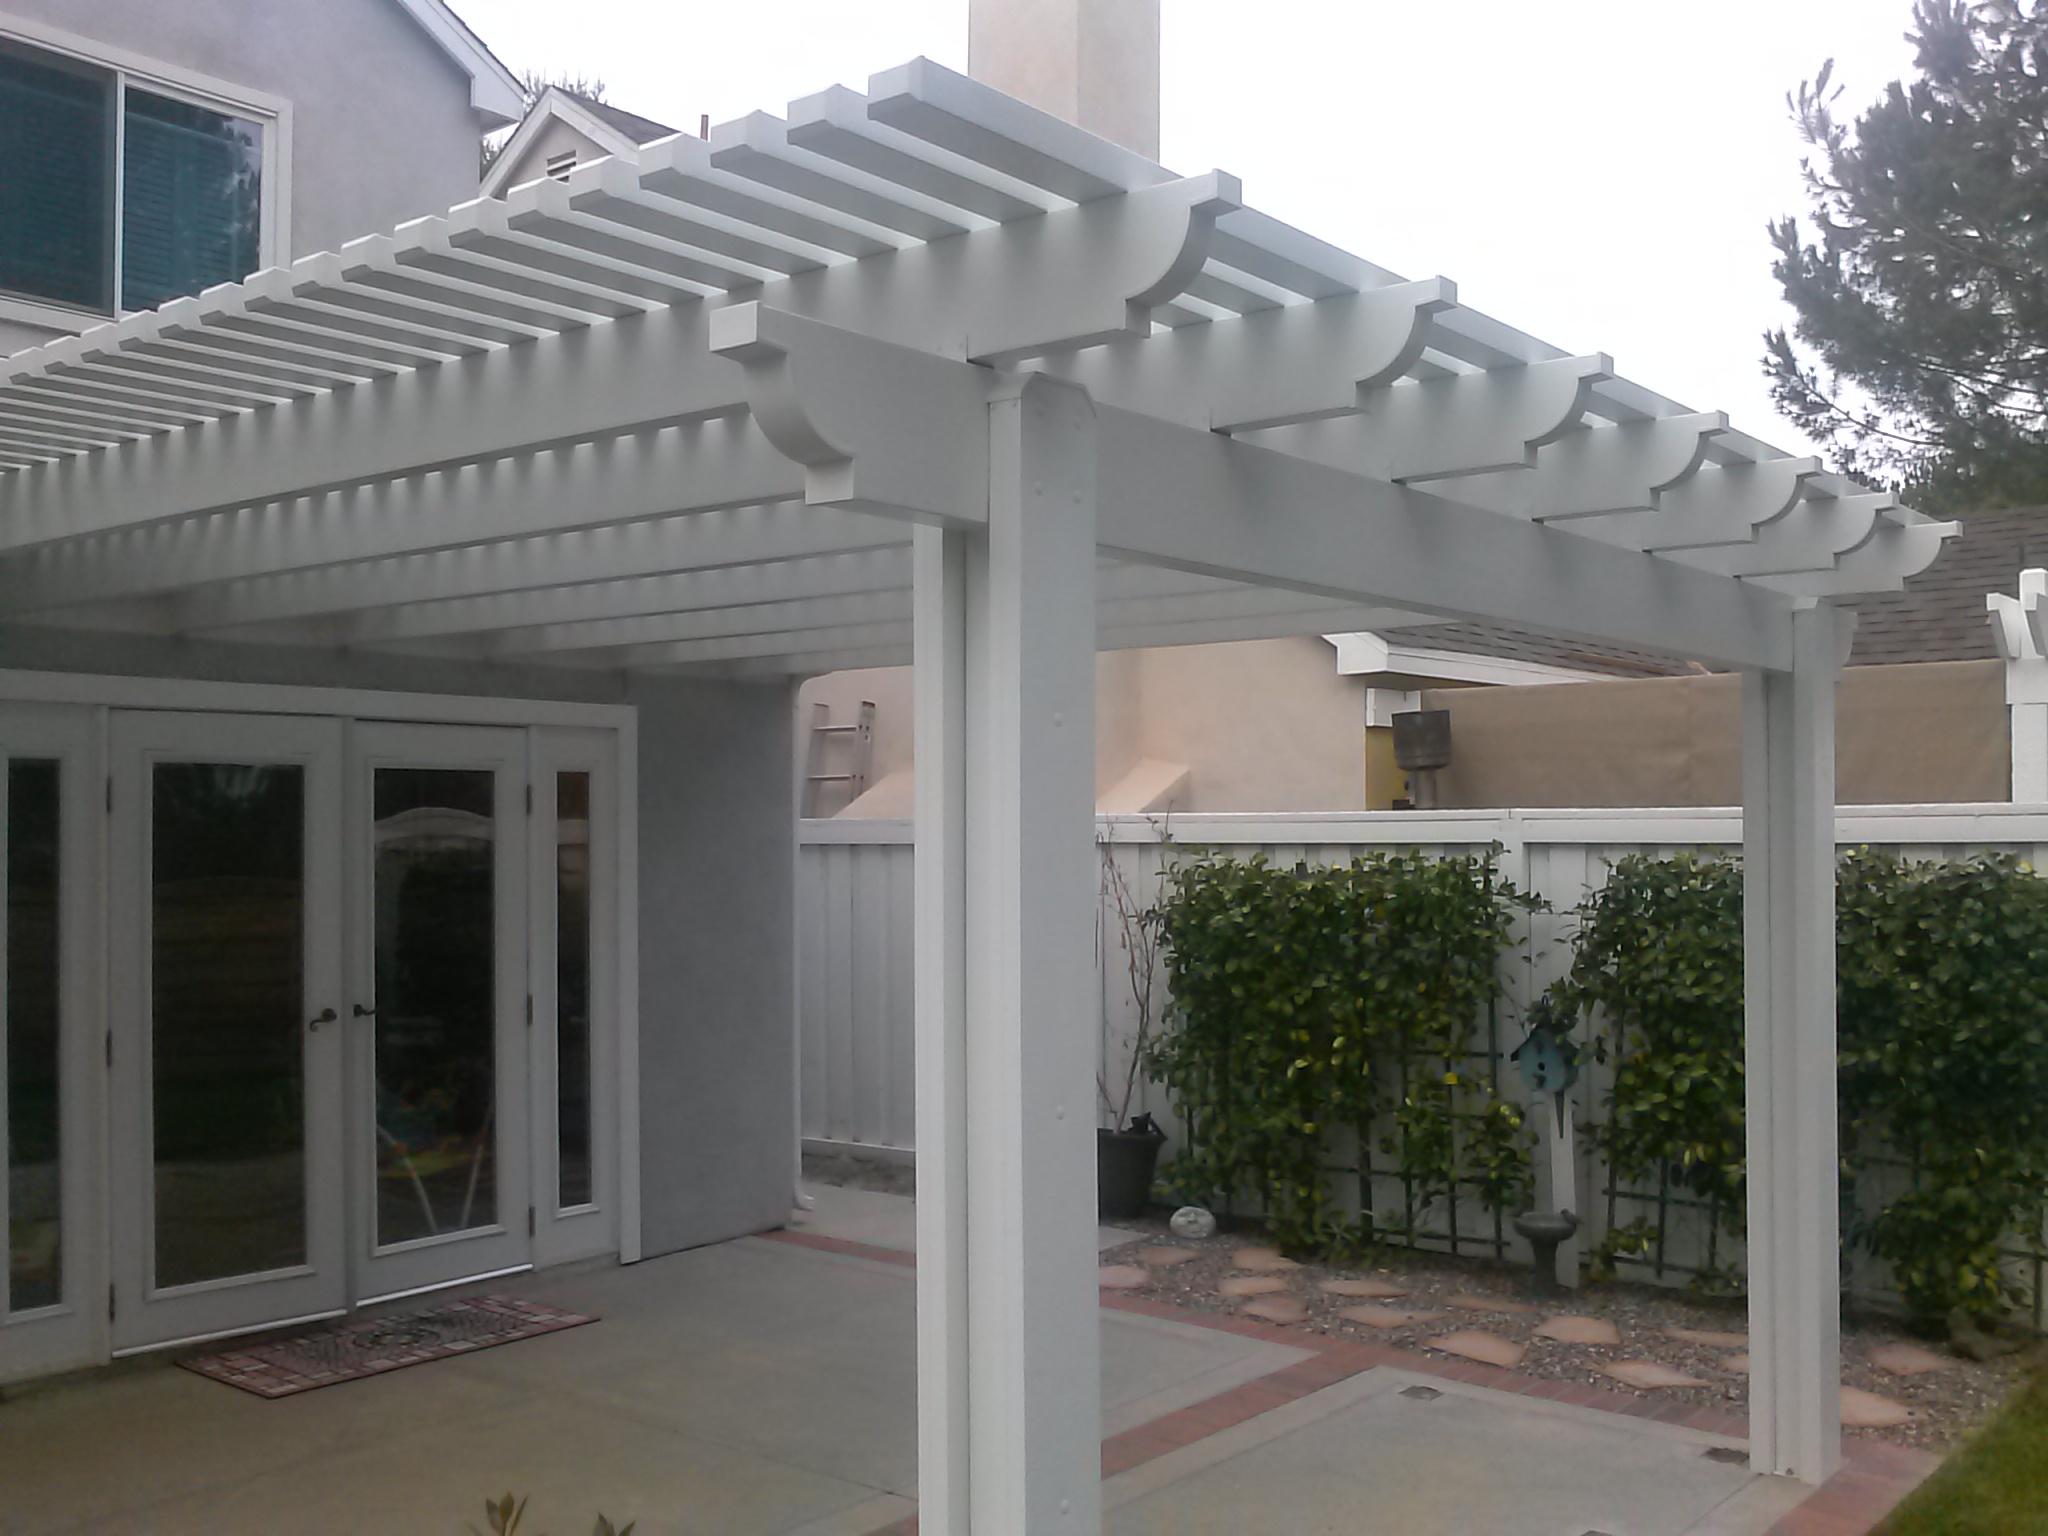 Orange County Alumawood Patio Covers vs Wood Patio Covers on Patio Cover Ideas Wood id=60982